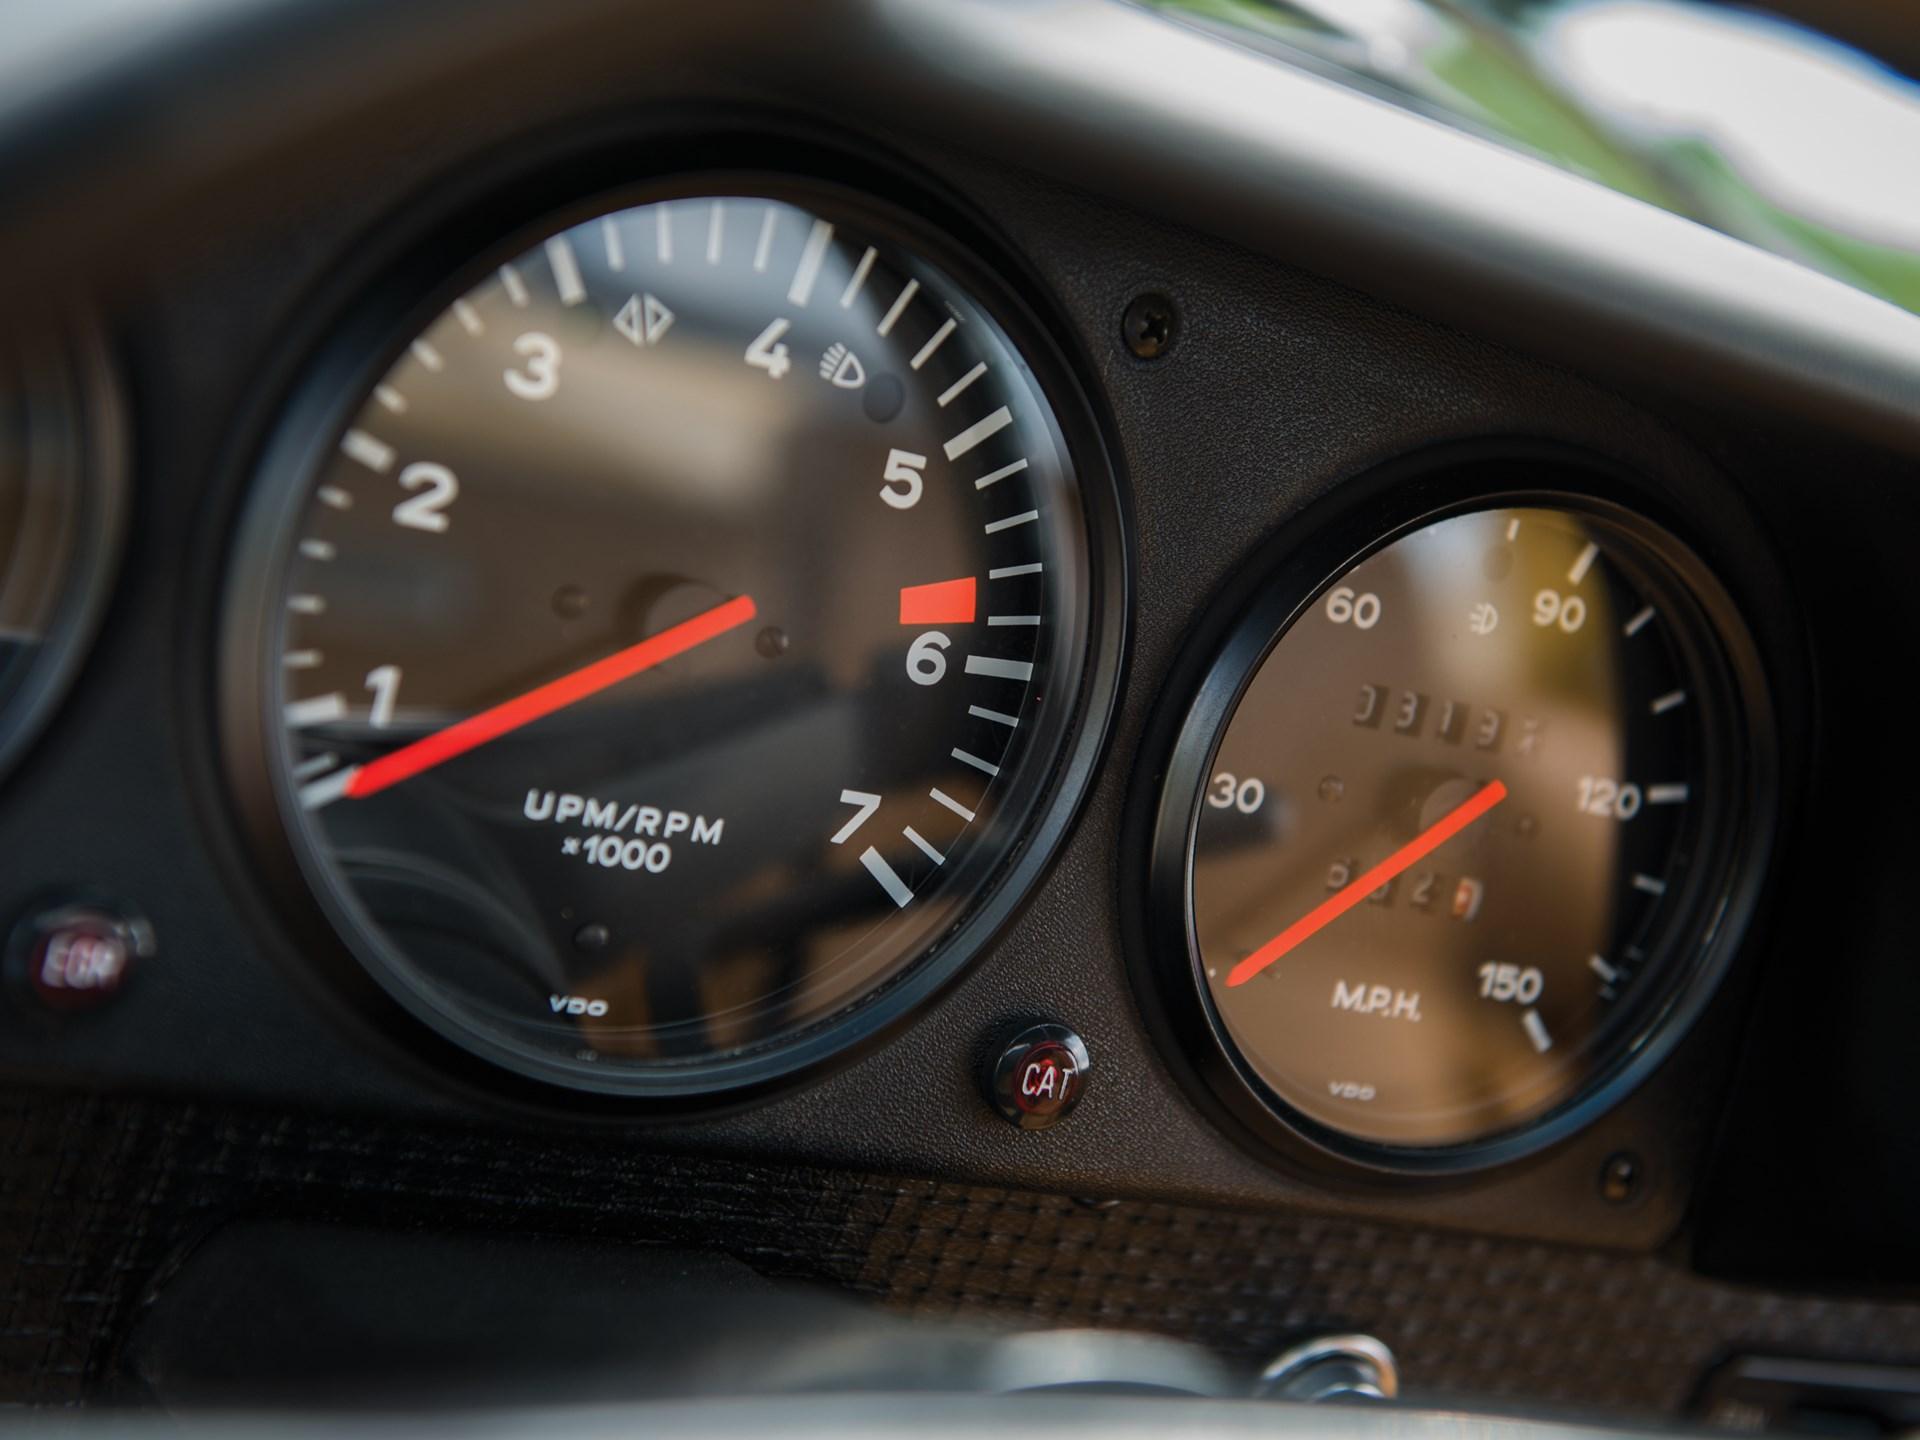 1975 Porsche 914 gauges